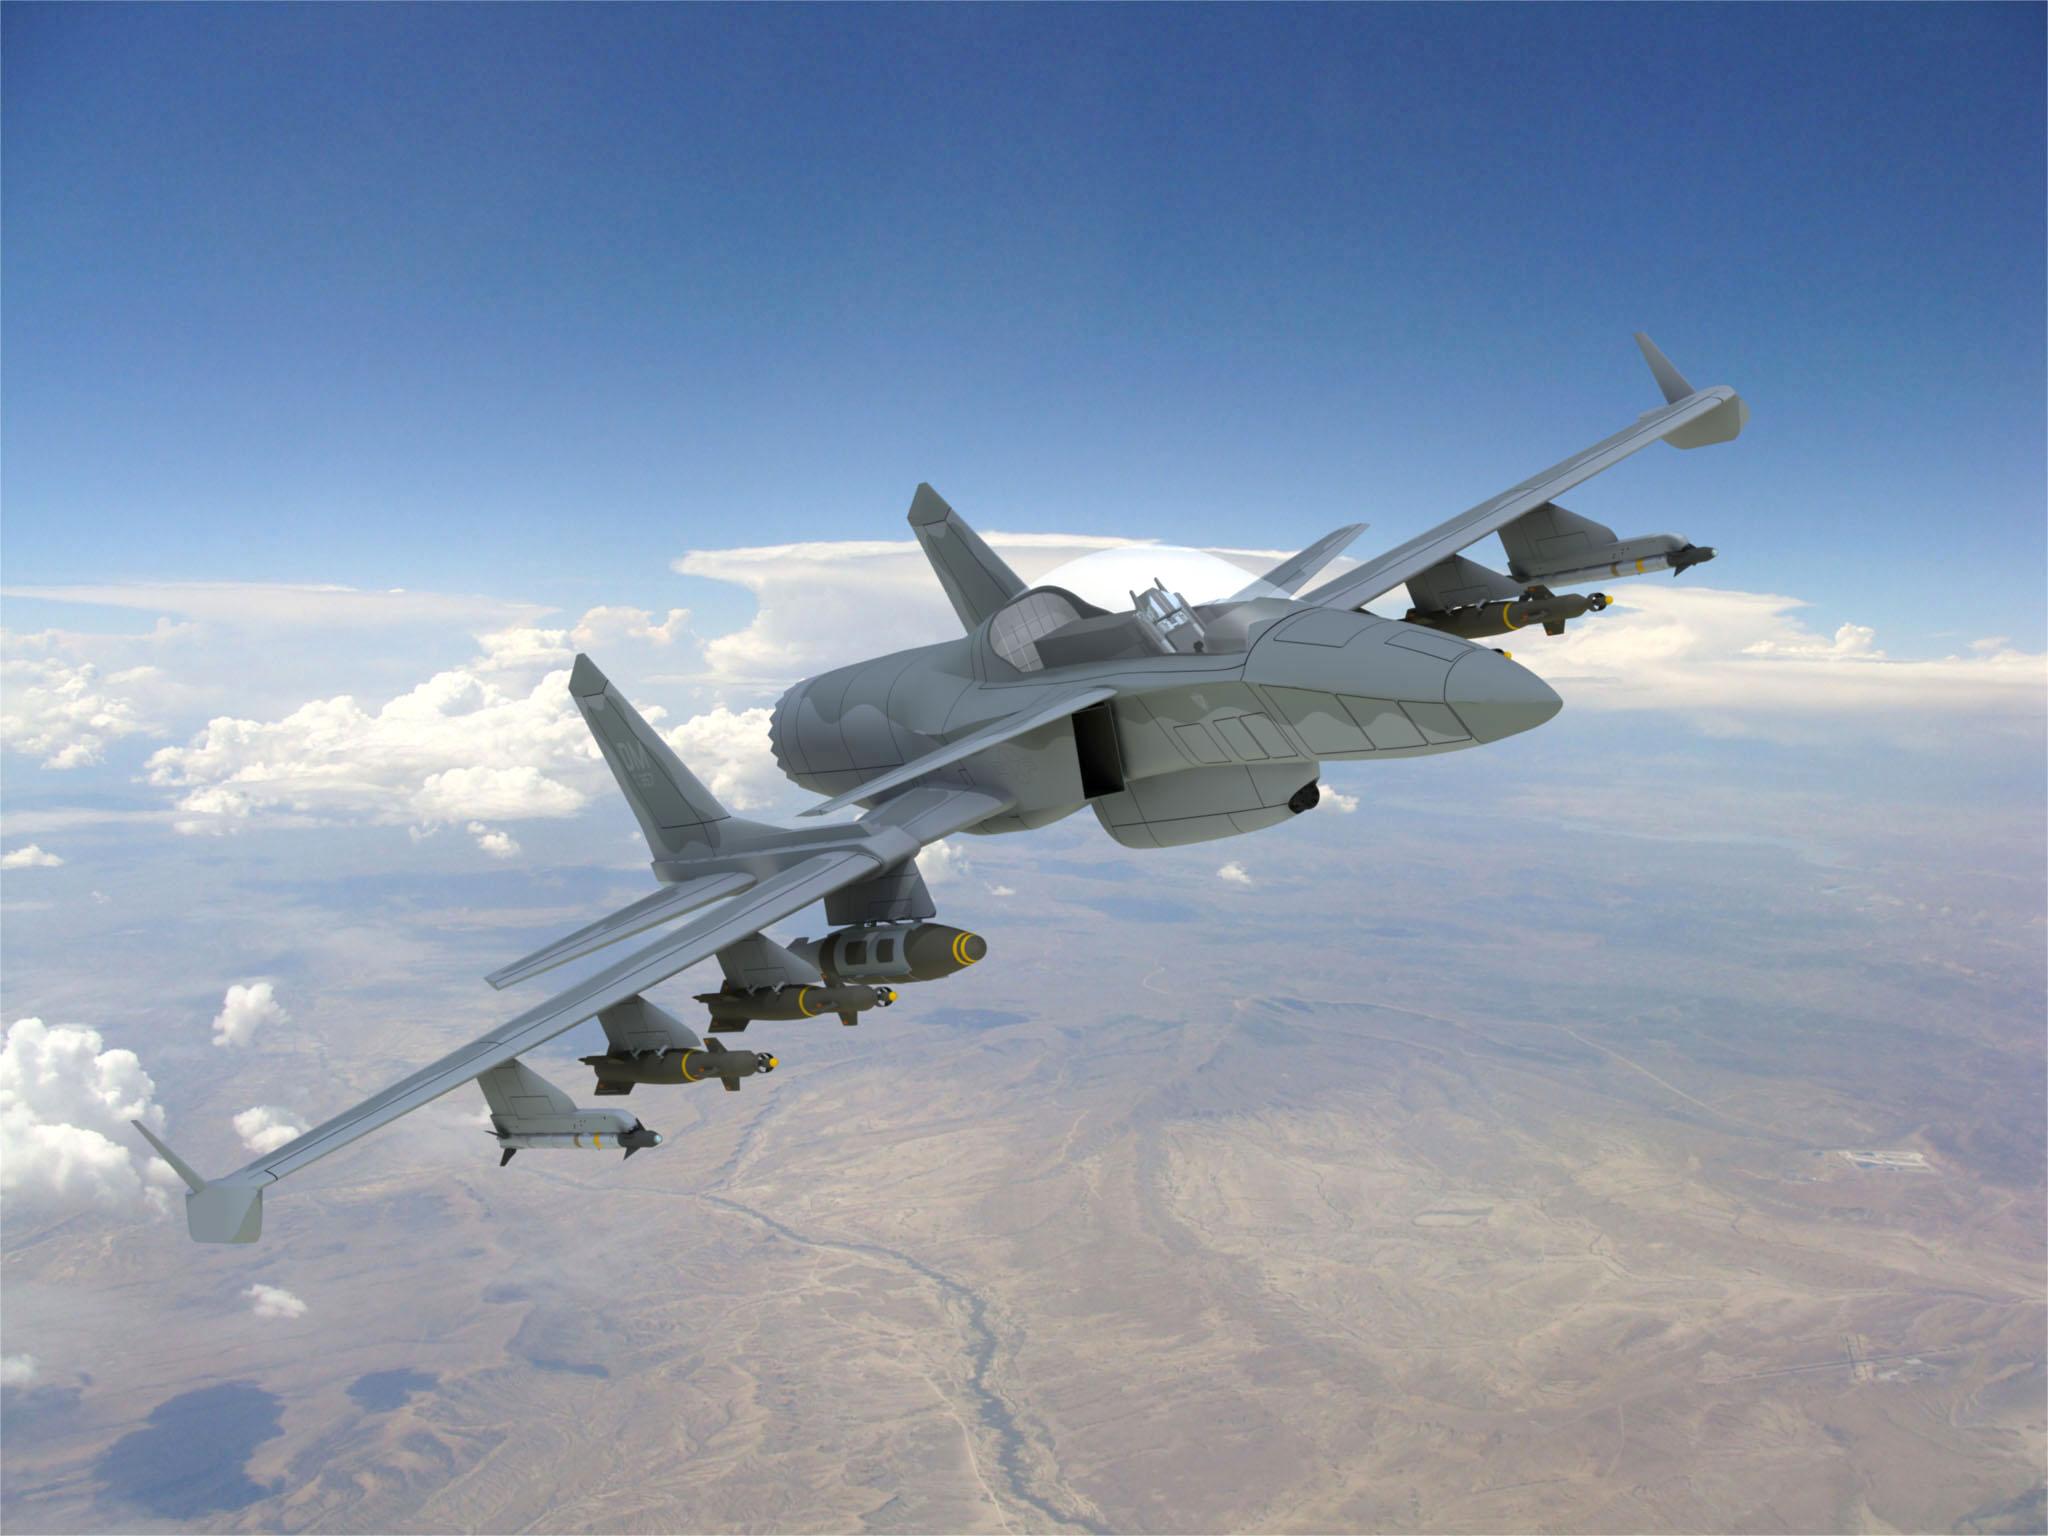 Stavatti, SM-28, Machete, Close Air Support, CAS, Light Attack Aircraft